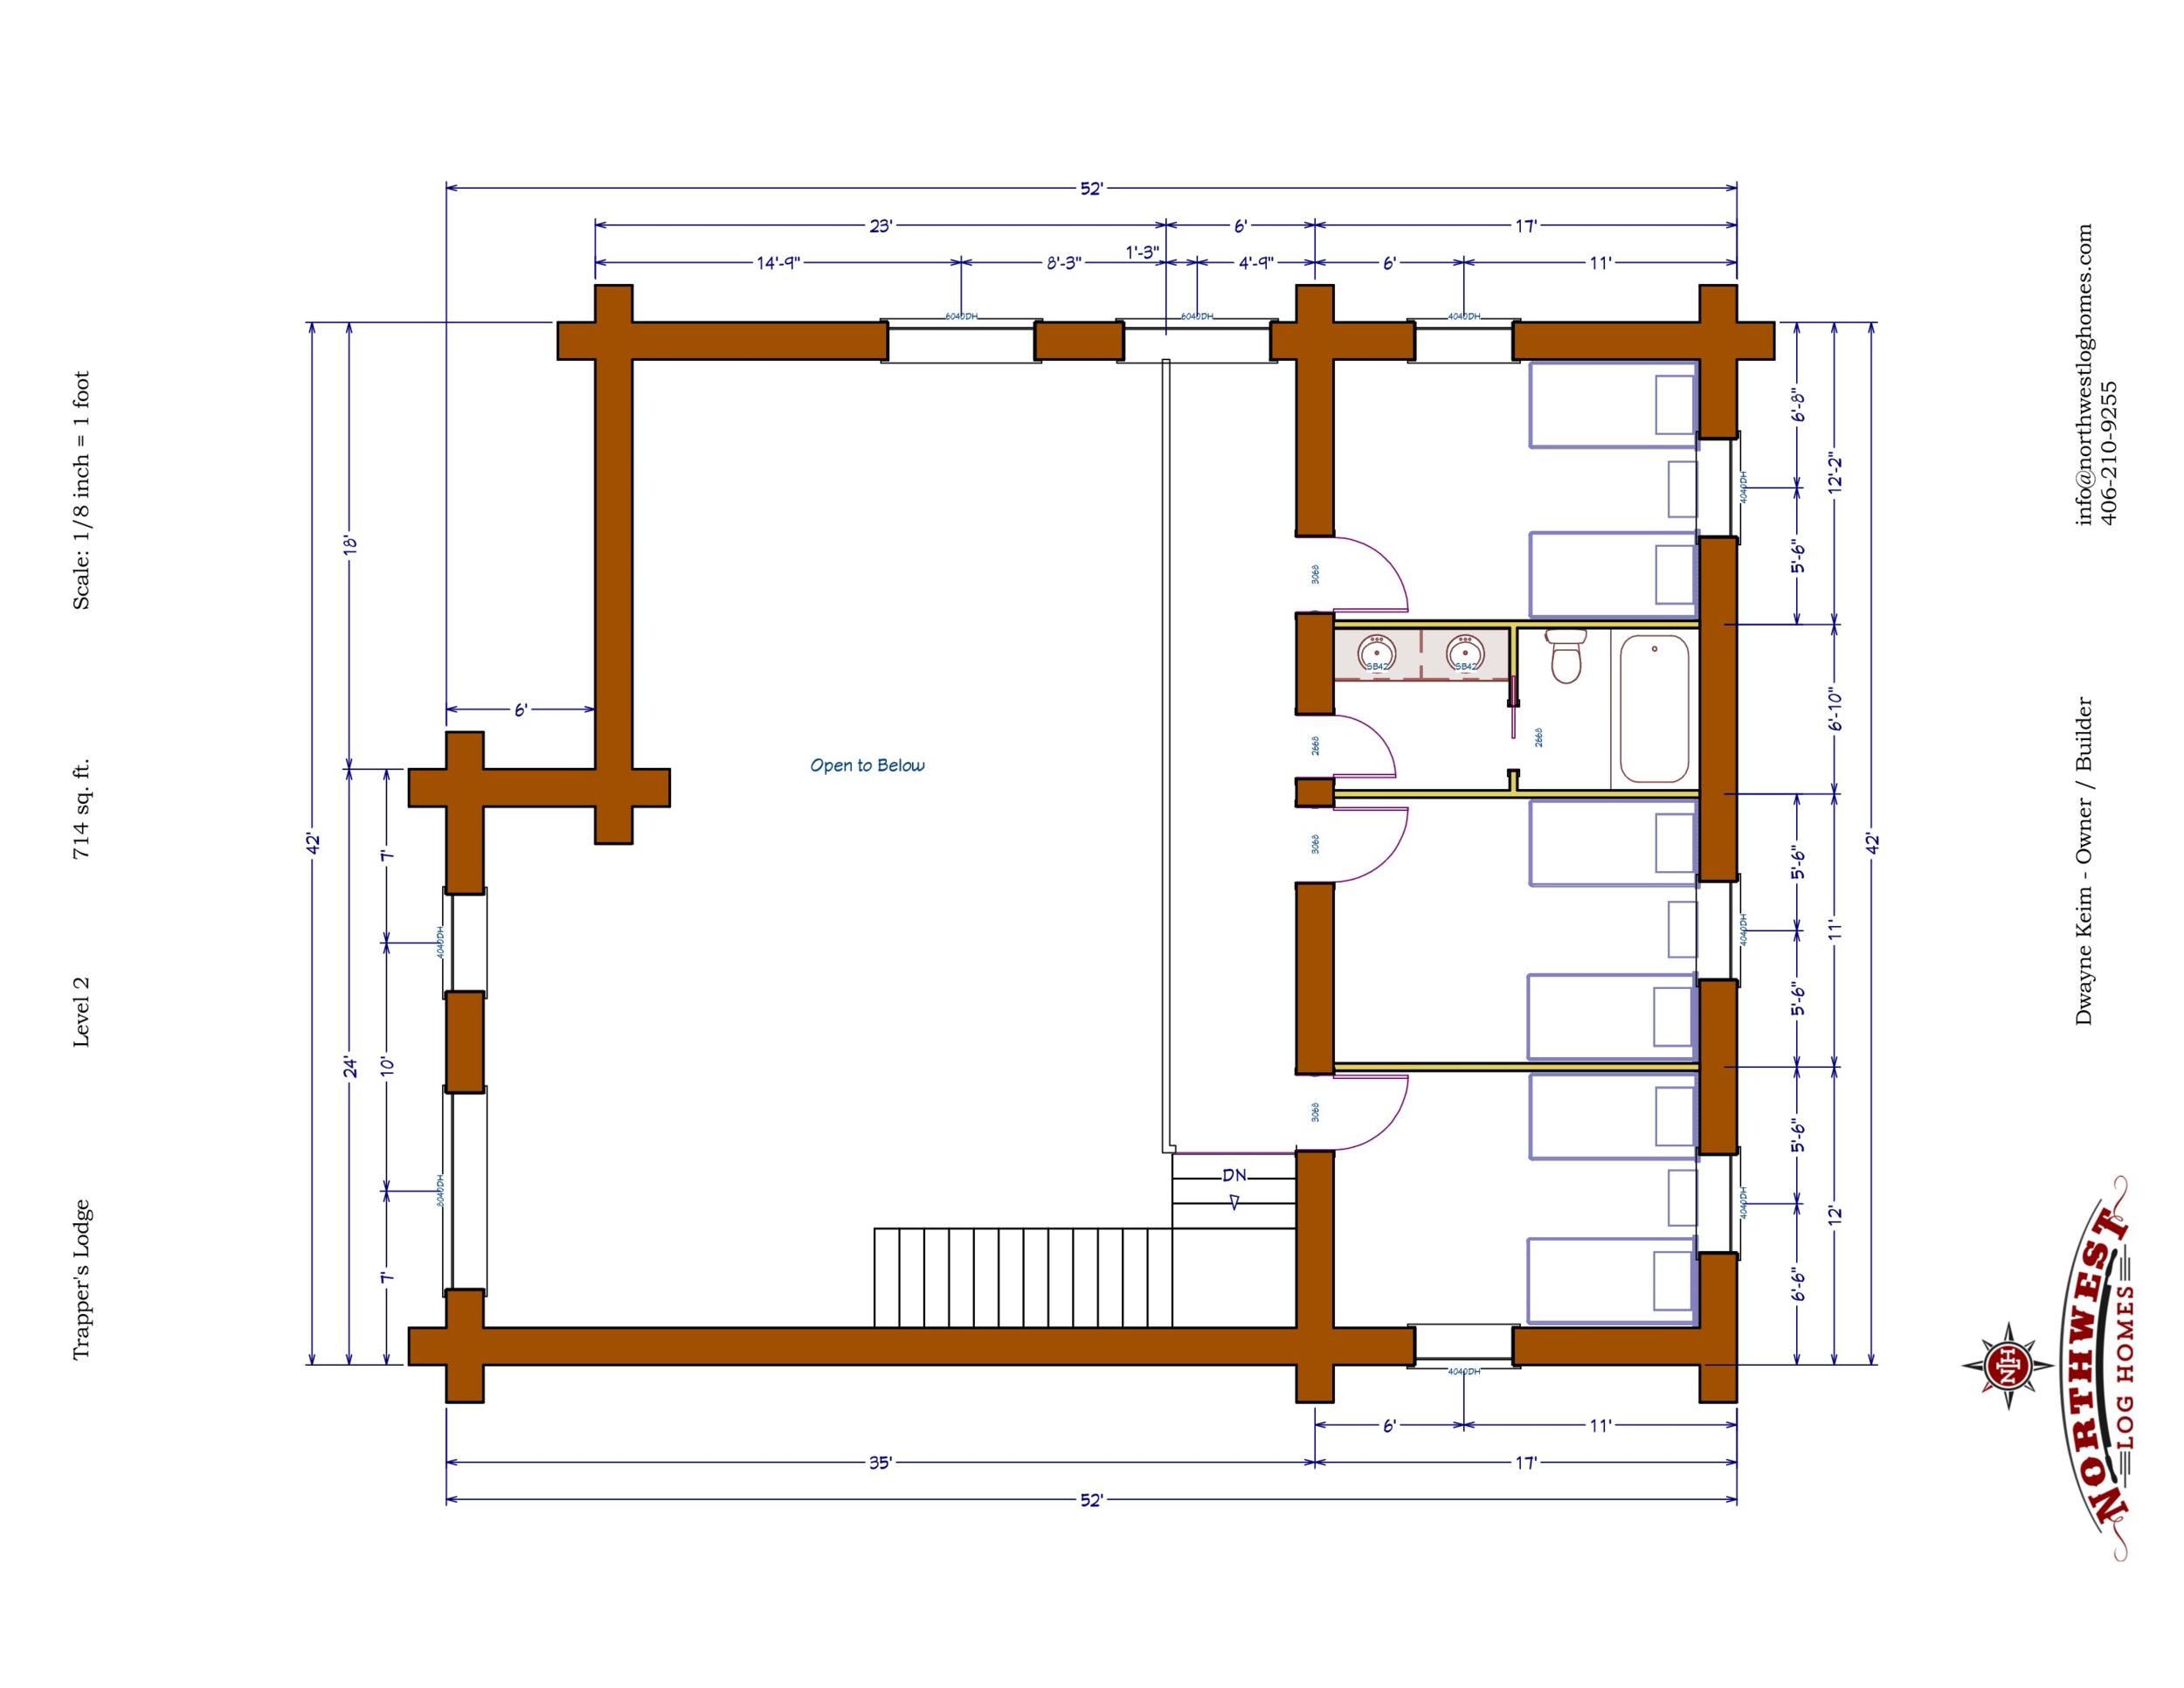 Loft - 714 sq. ft.